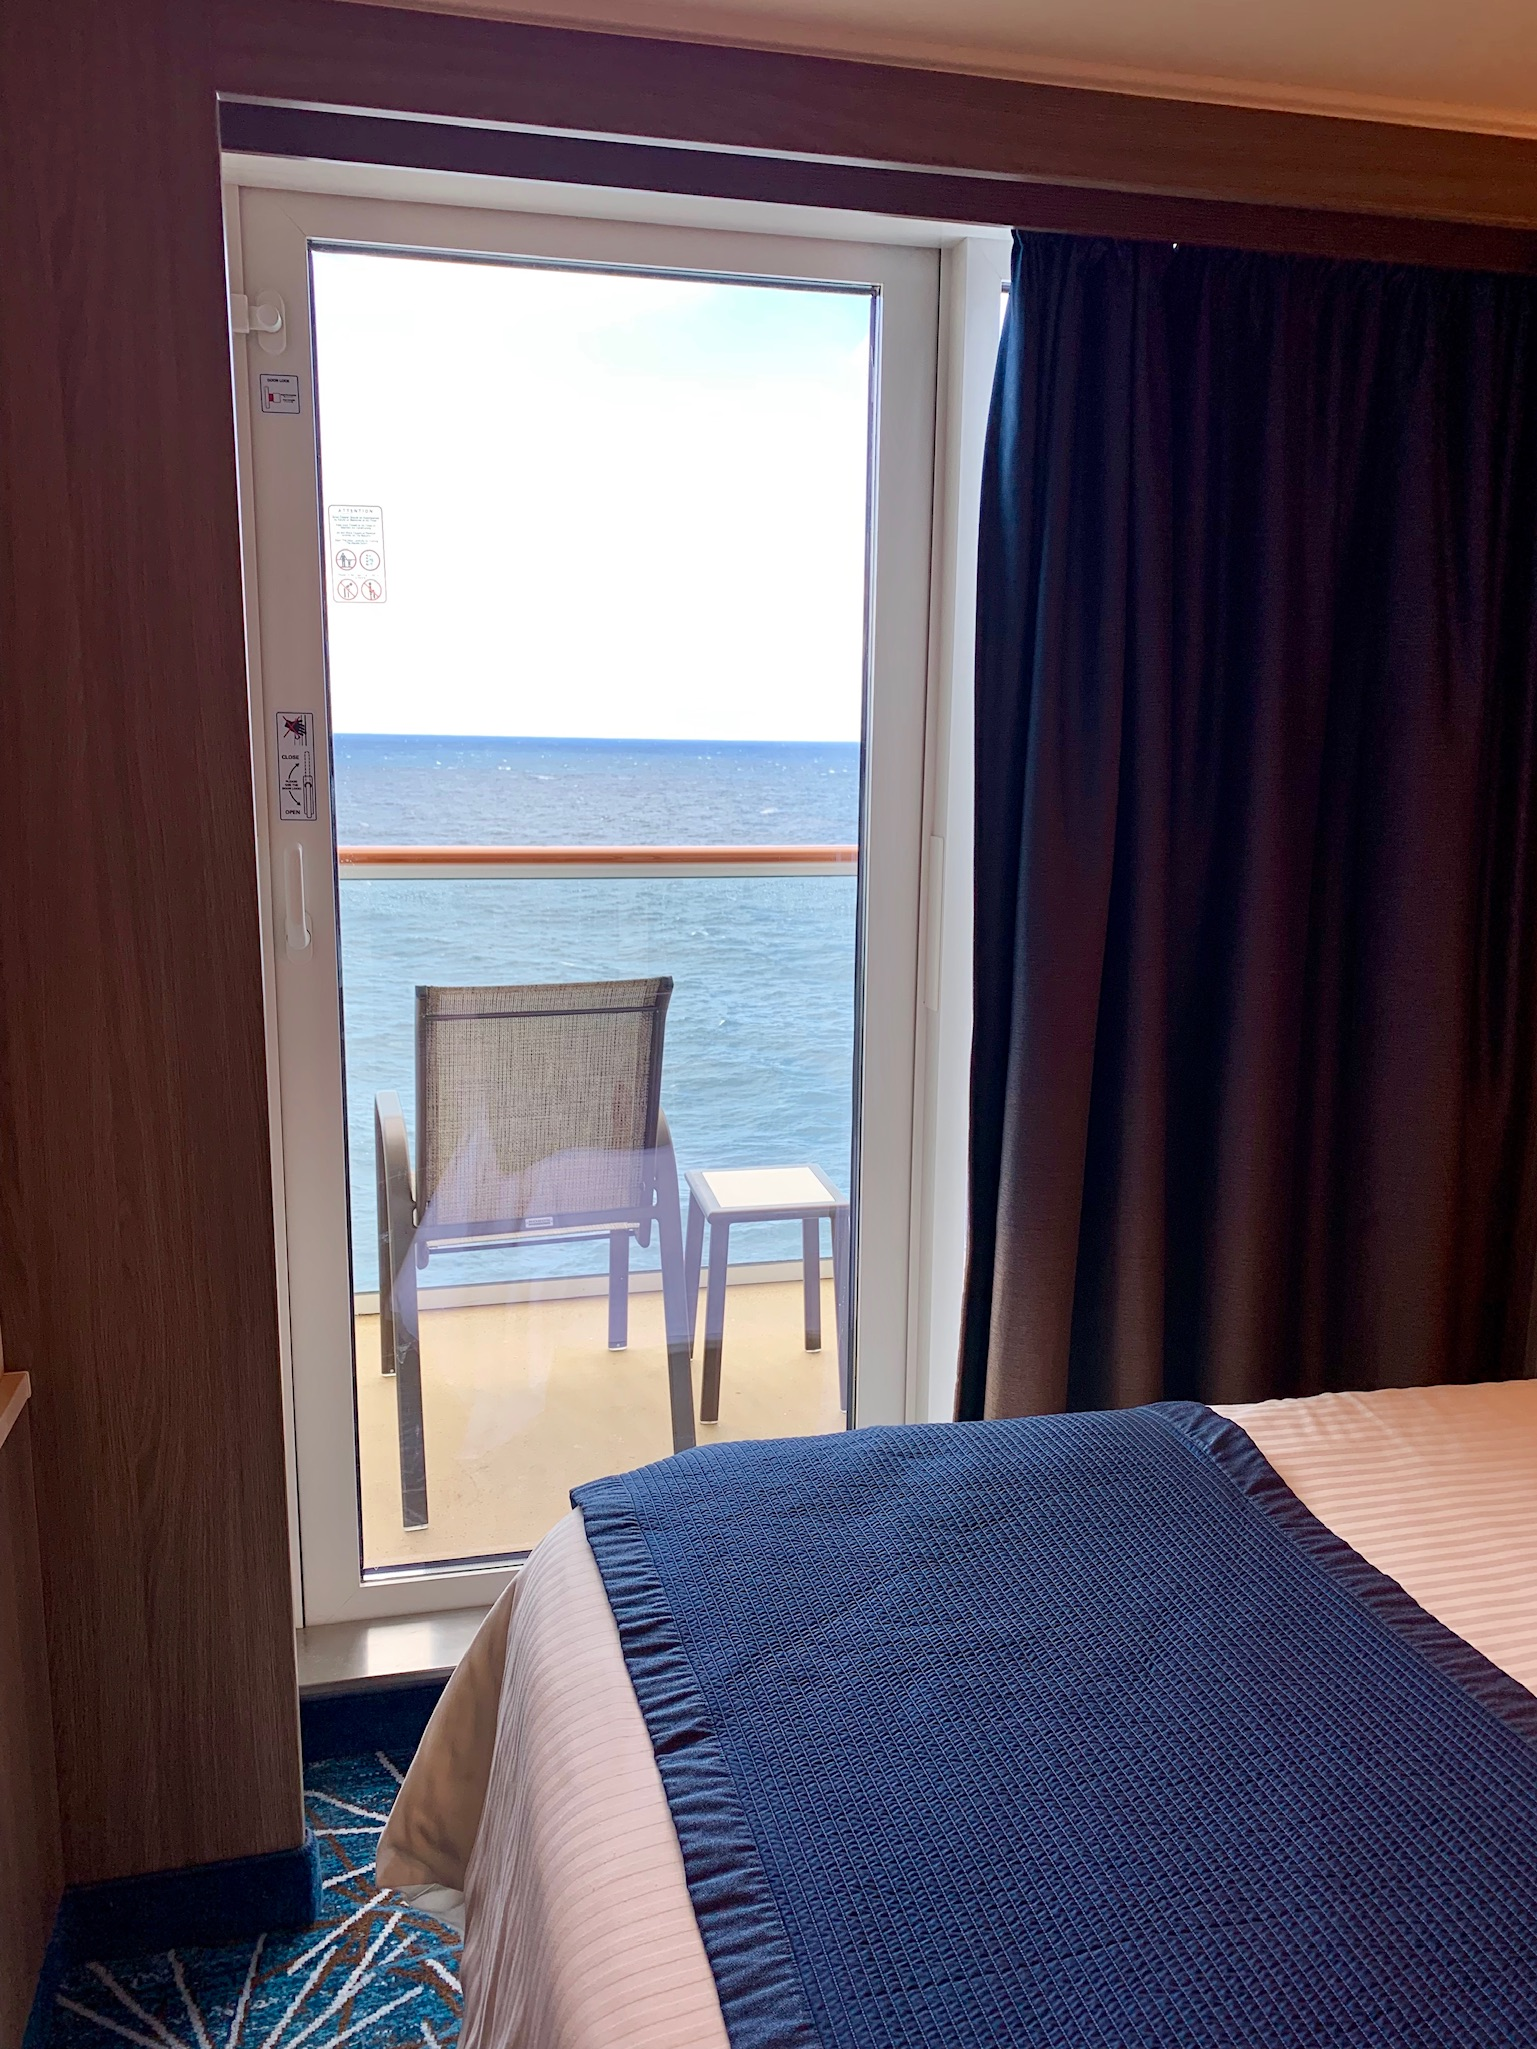 NCL Joy Midship Balcony View